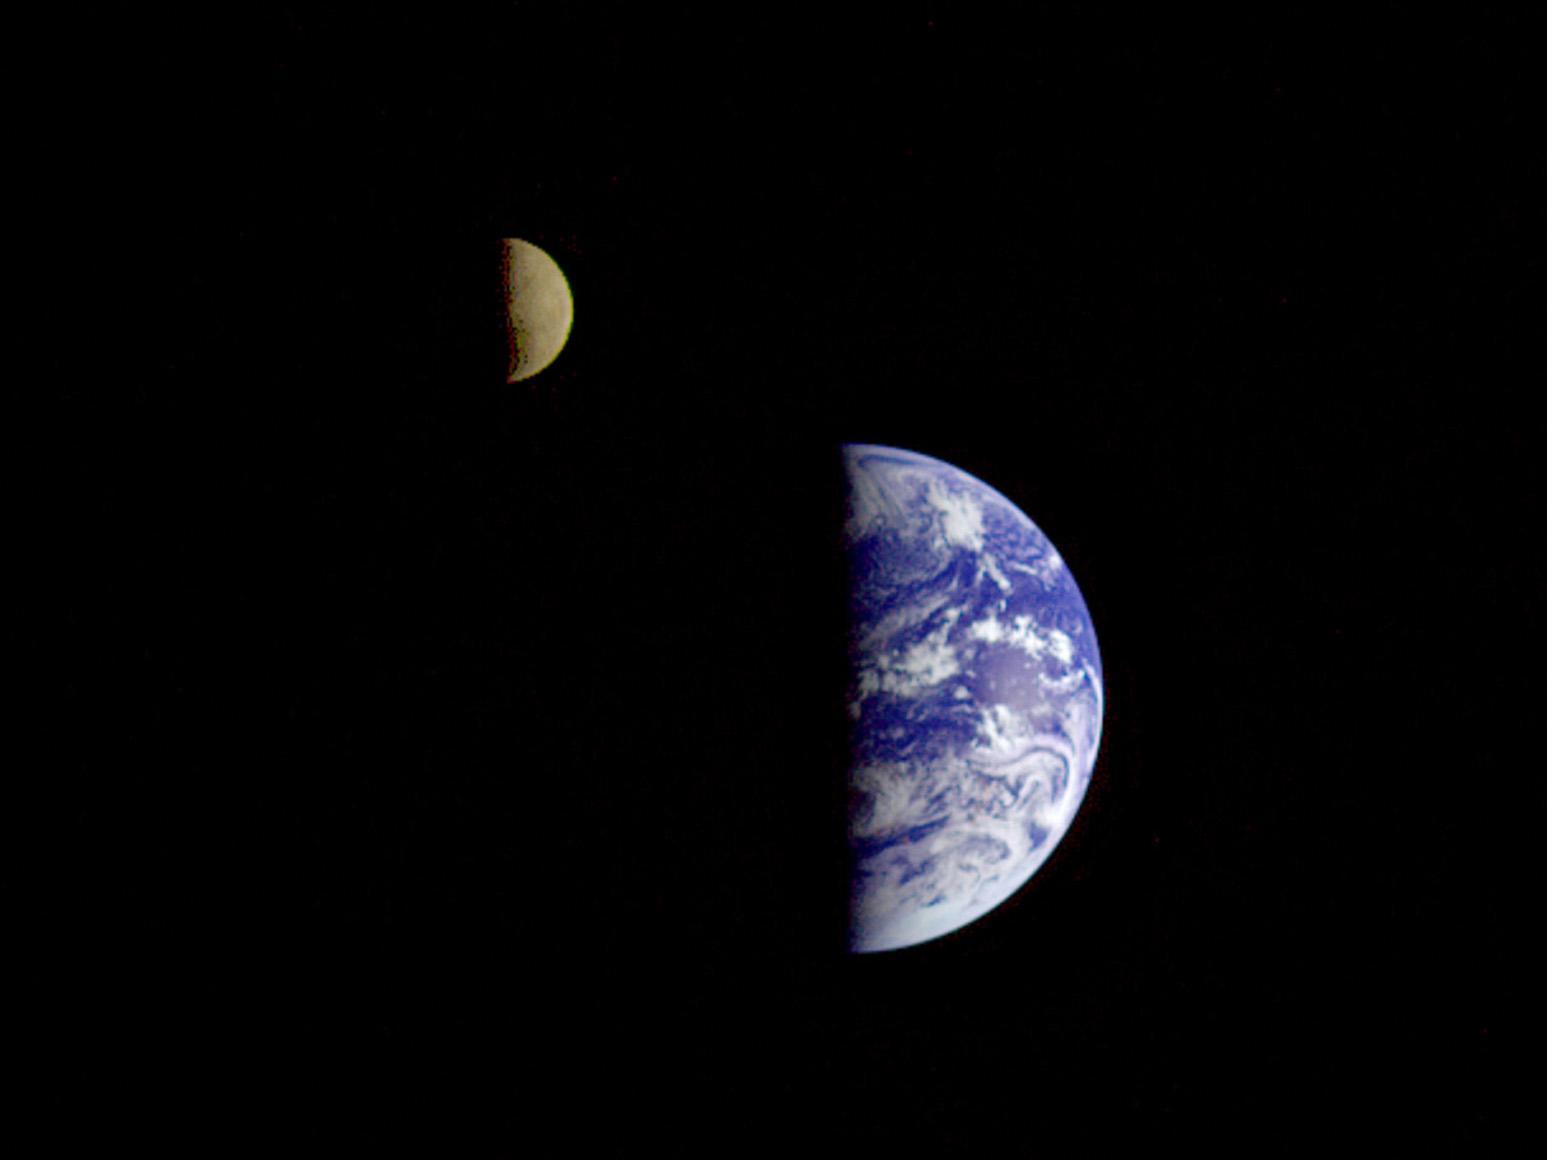 Talkclaimed Moons Of Earth Wikipedia 7924554 Moonphasesdiagram1jpg Fileearth And Moon Wikimedia Commons